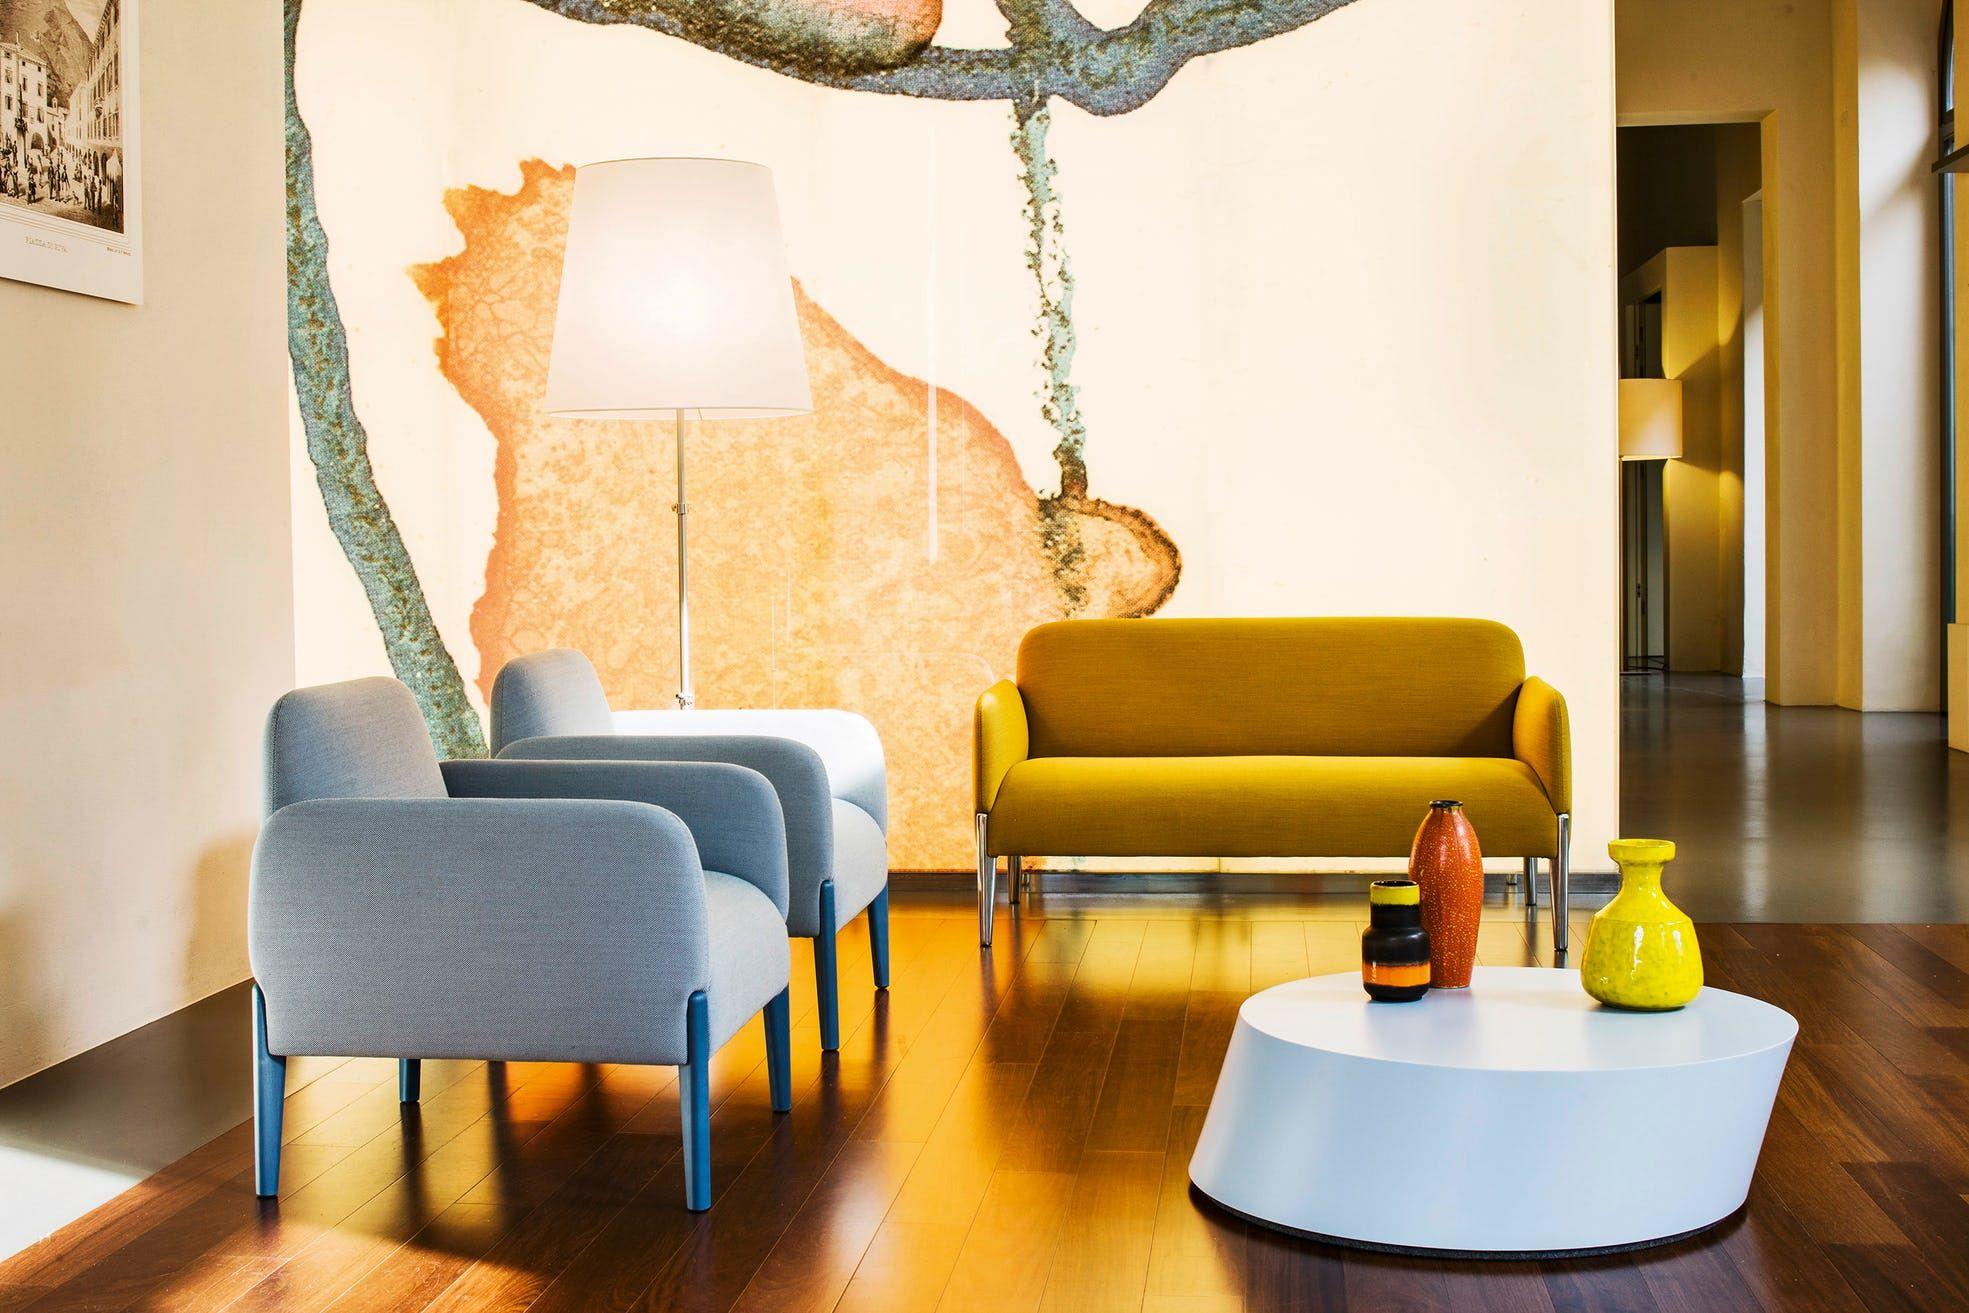 Join Sofa By La Cividina Living Room Design Modern Contemporary Furniture Design 2 Seater Sofa